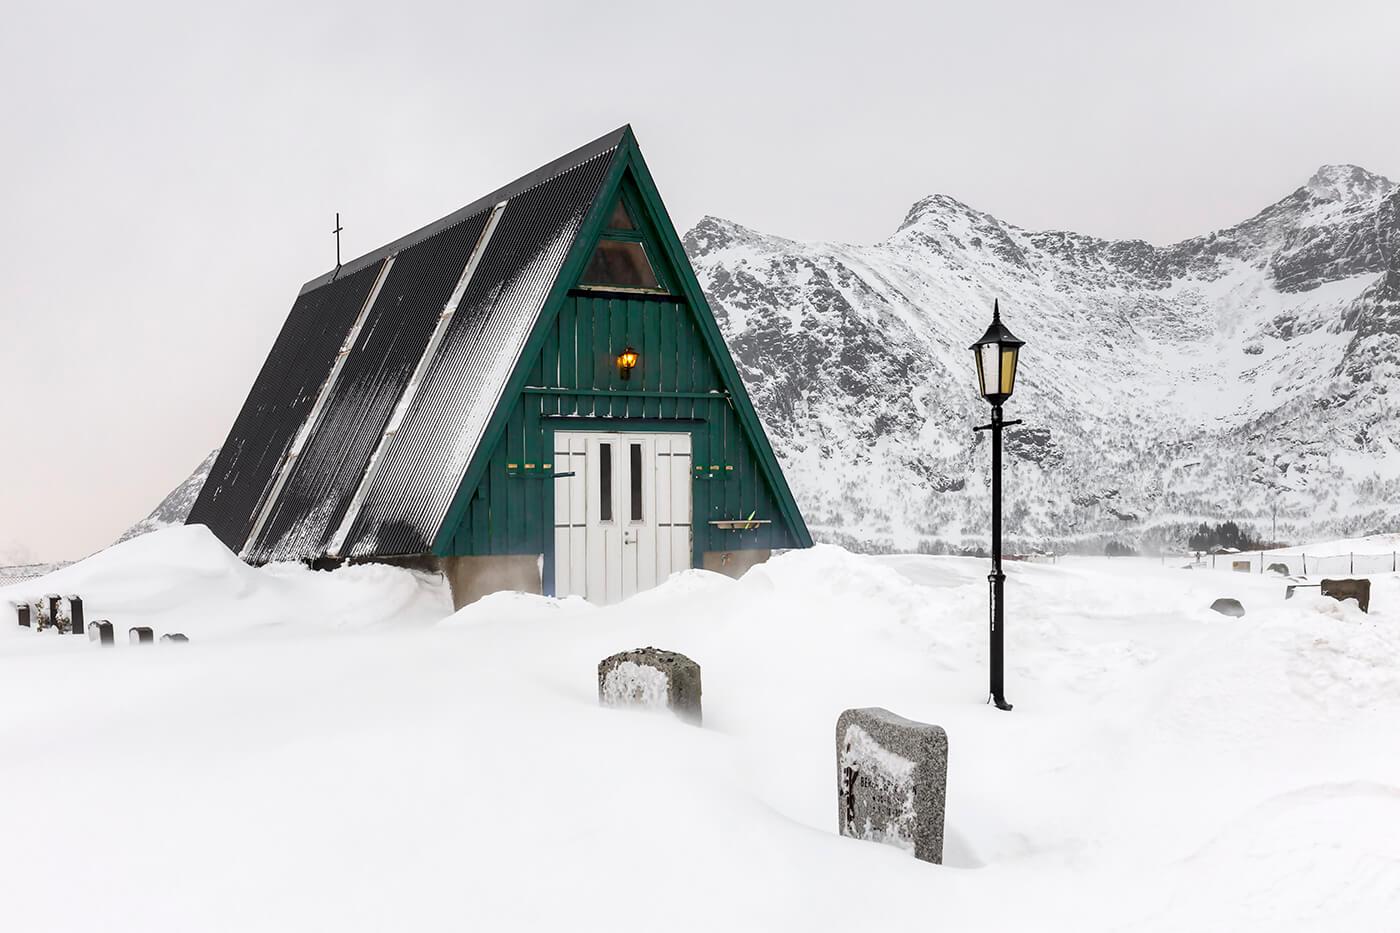 Green Shed, Cemetery, Flakstad, Lofoten, Norway